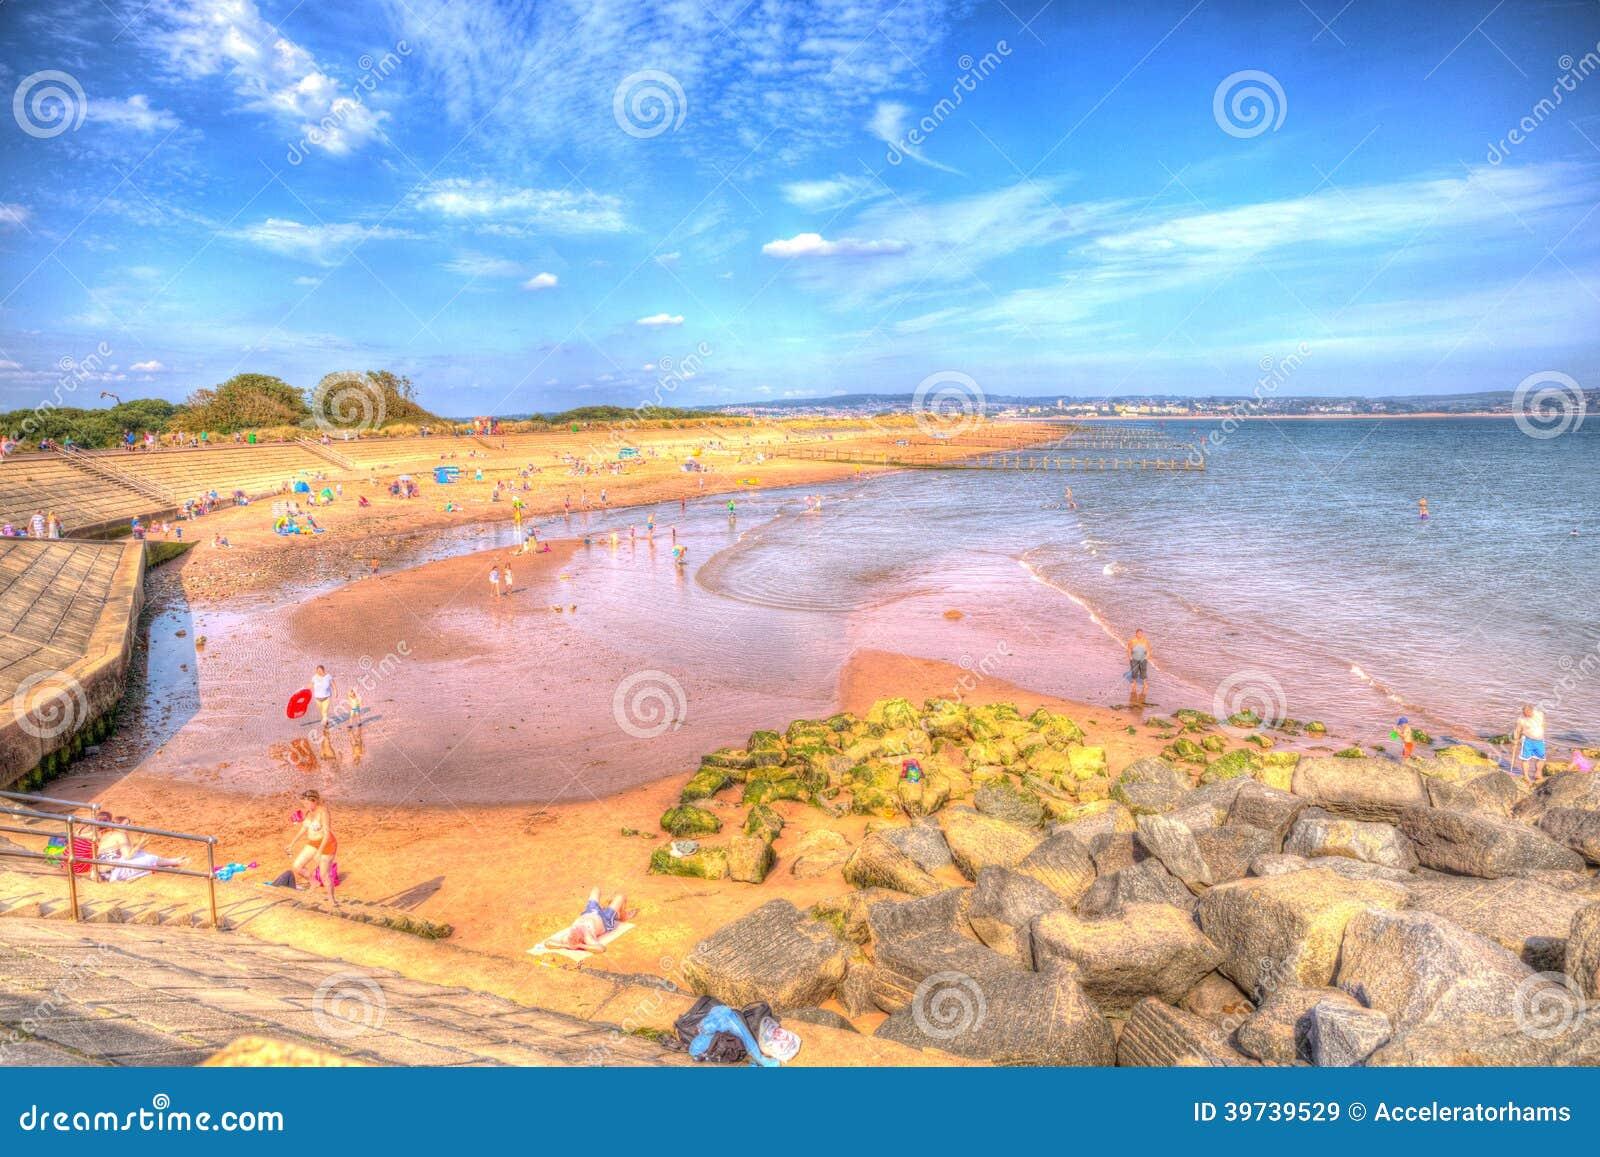 Holidaymakers enjoying the heatwave in Dawlish Warren beach Devon on a summer day in 2013